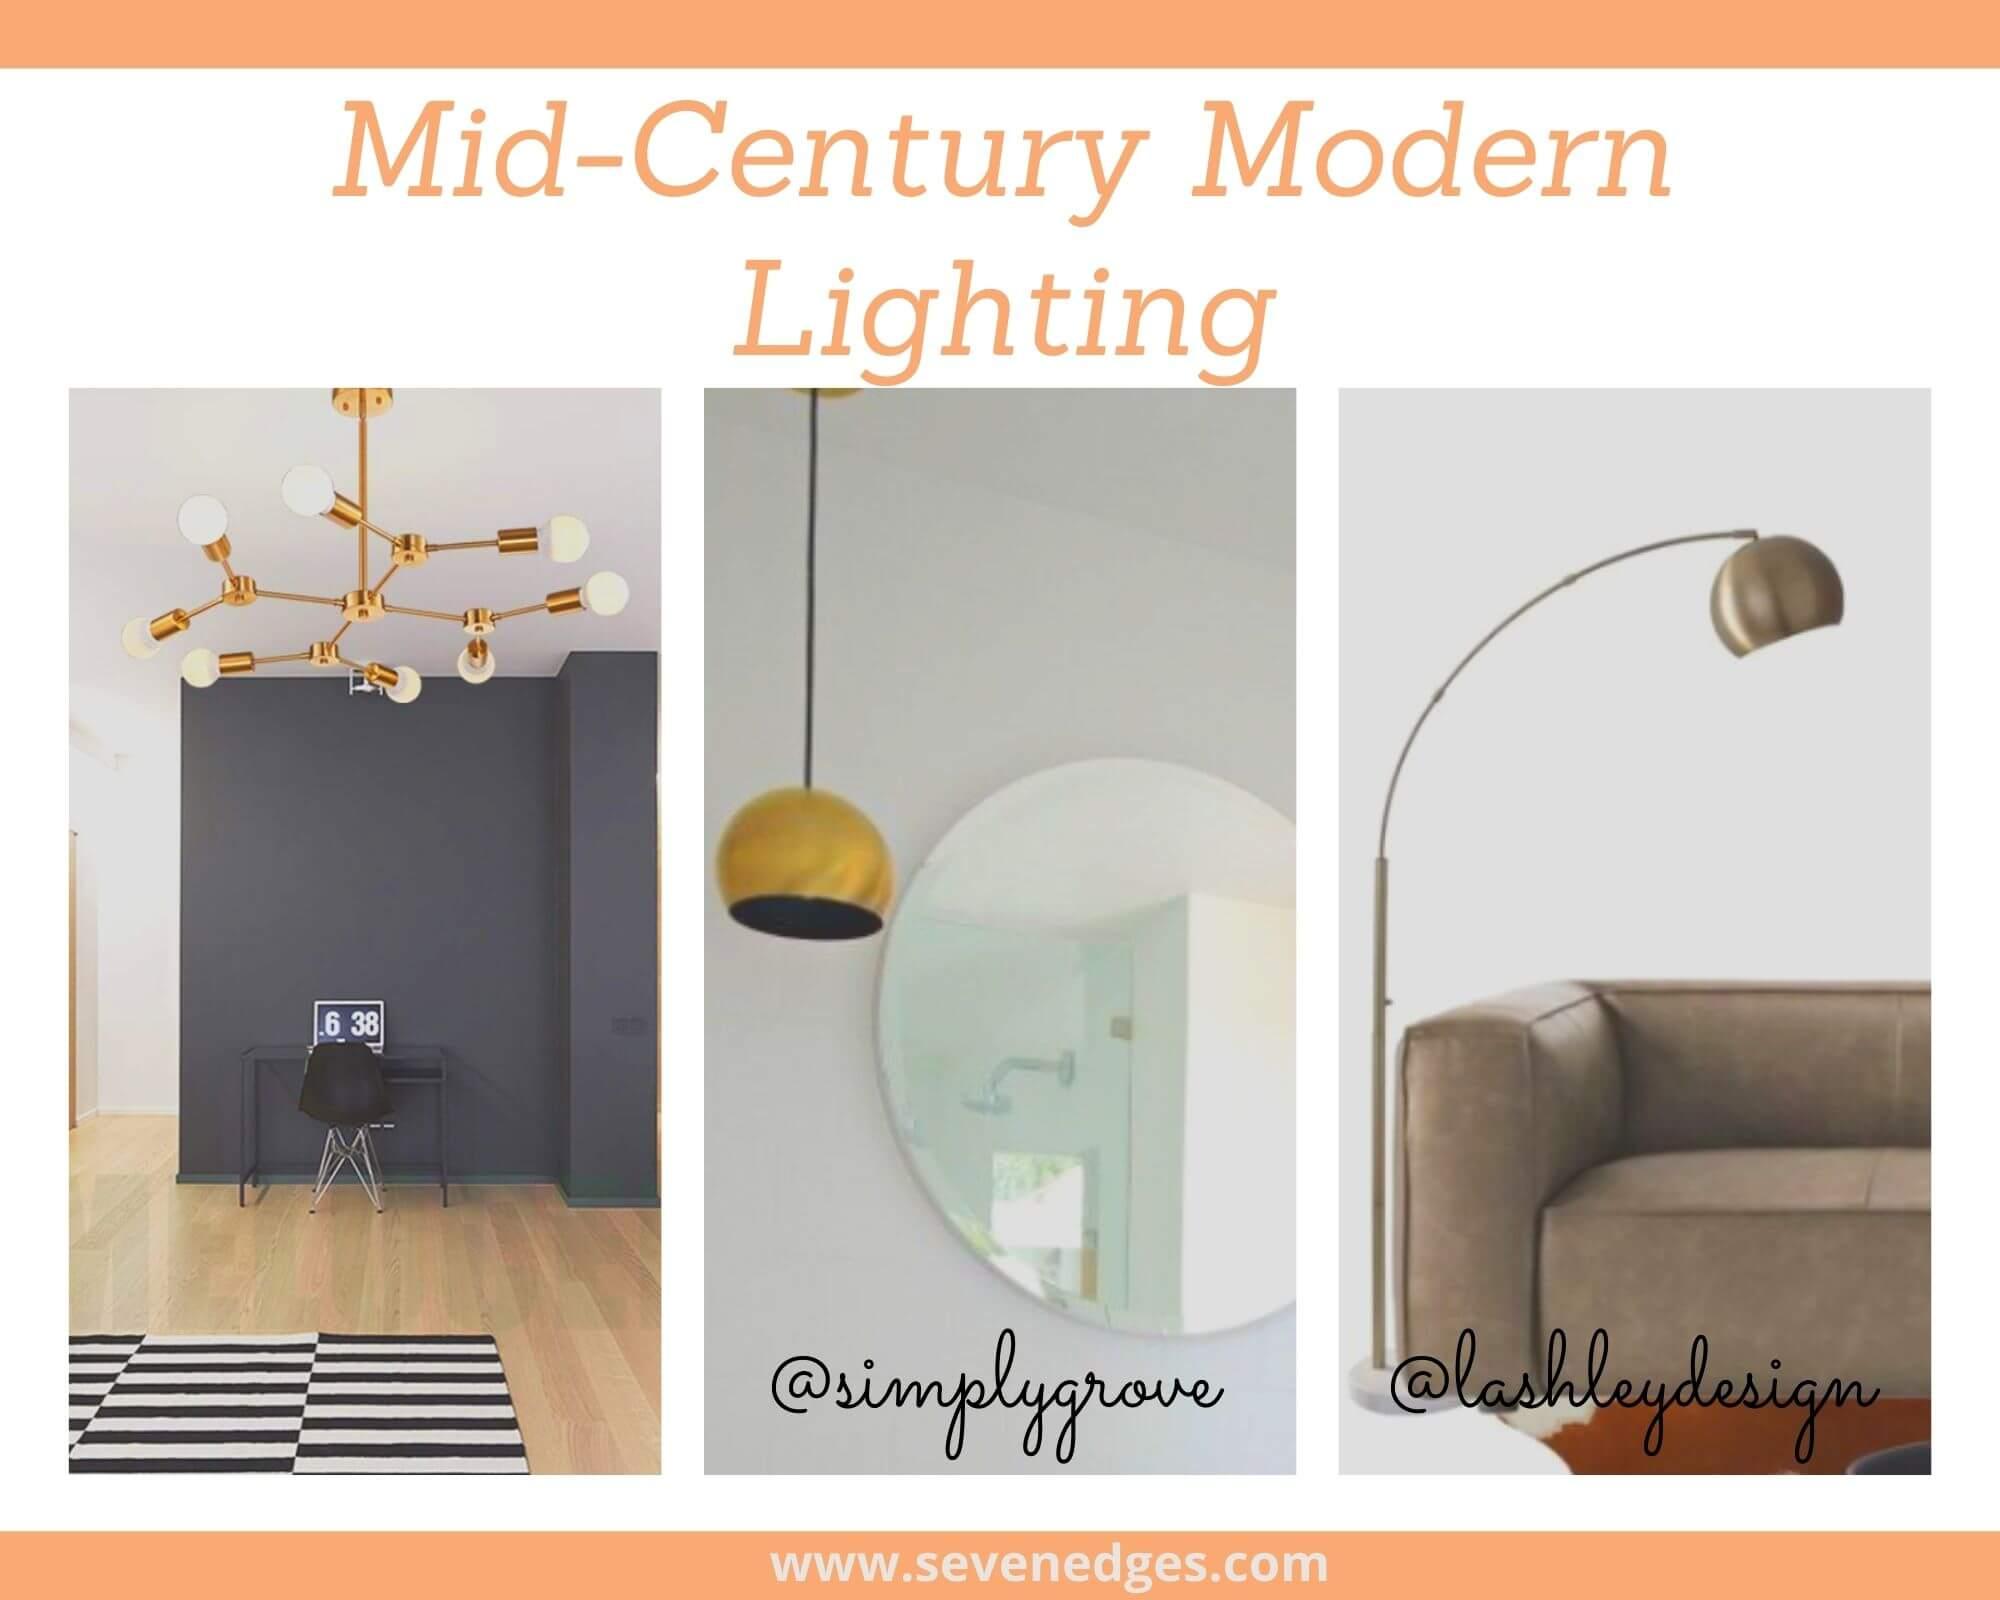 mid-century modern Lighting